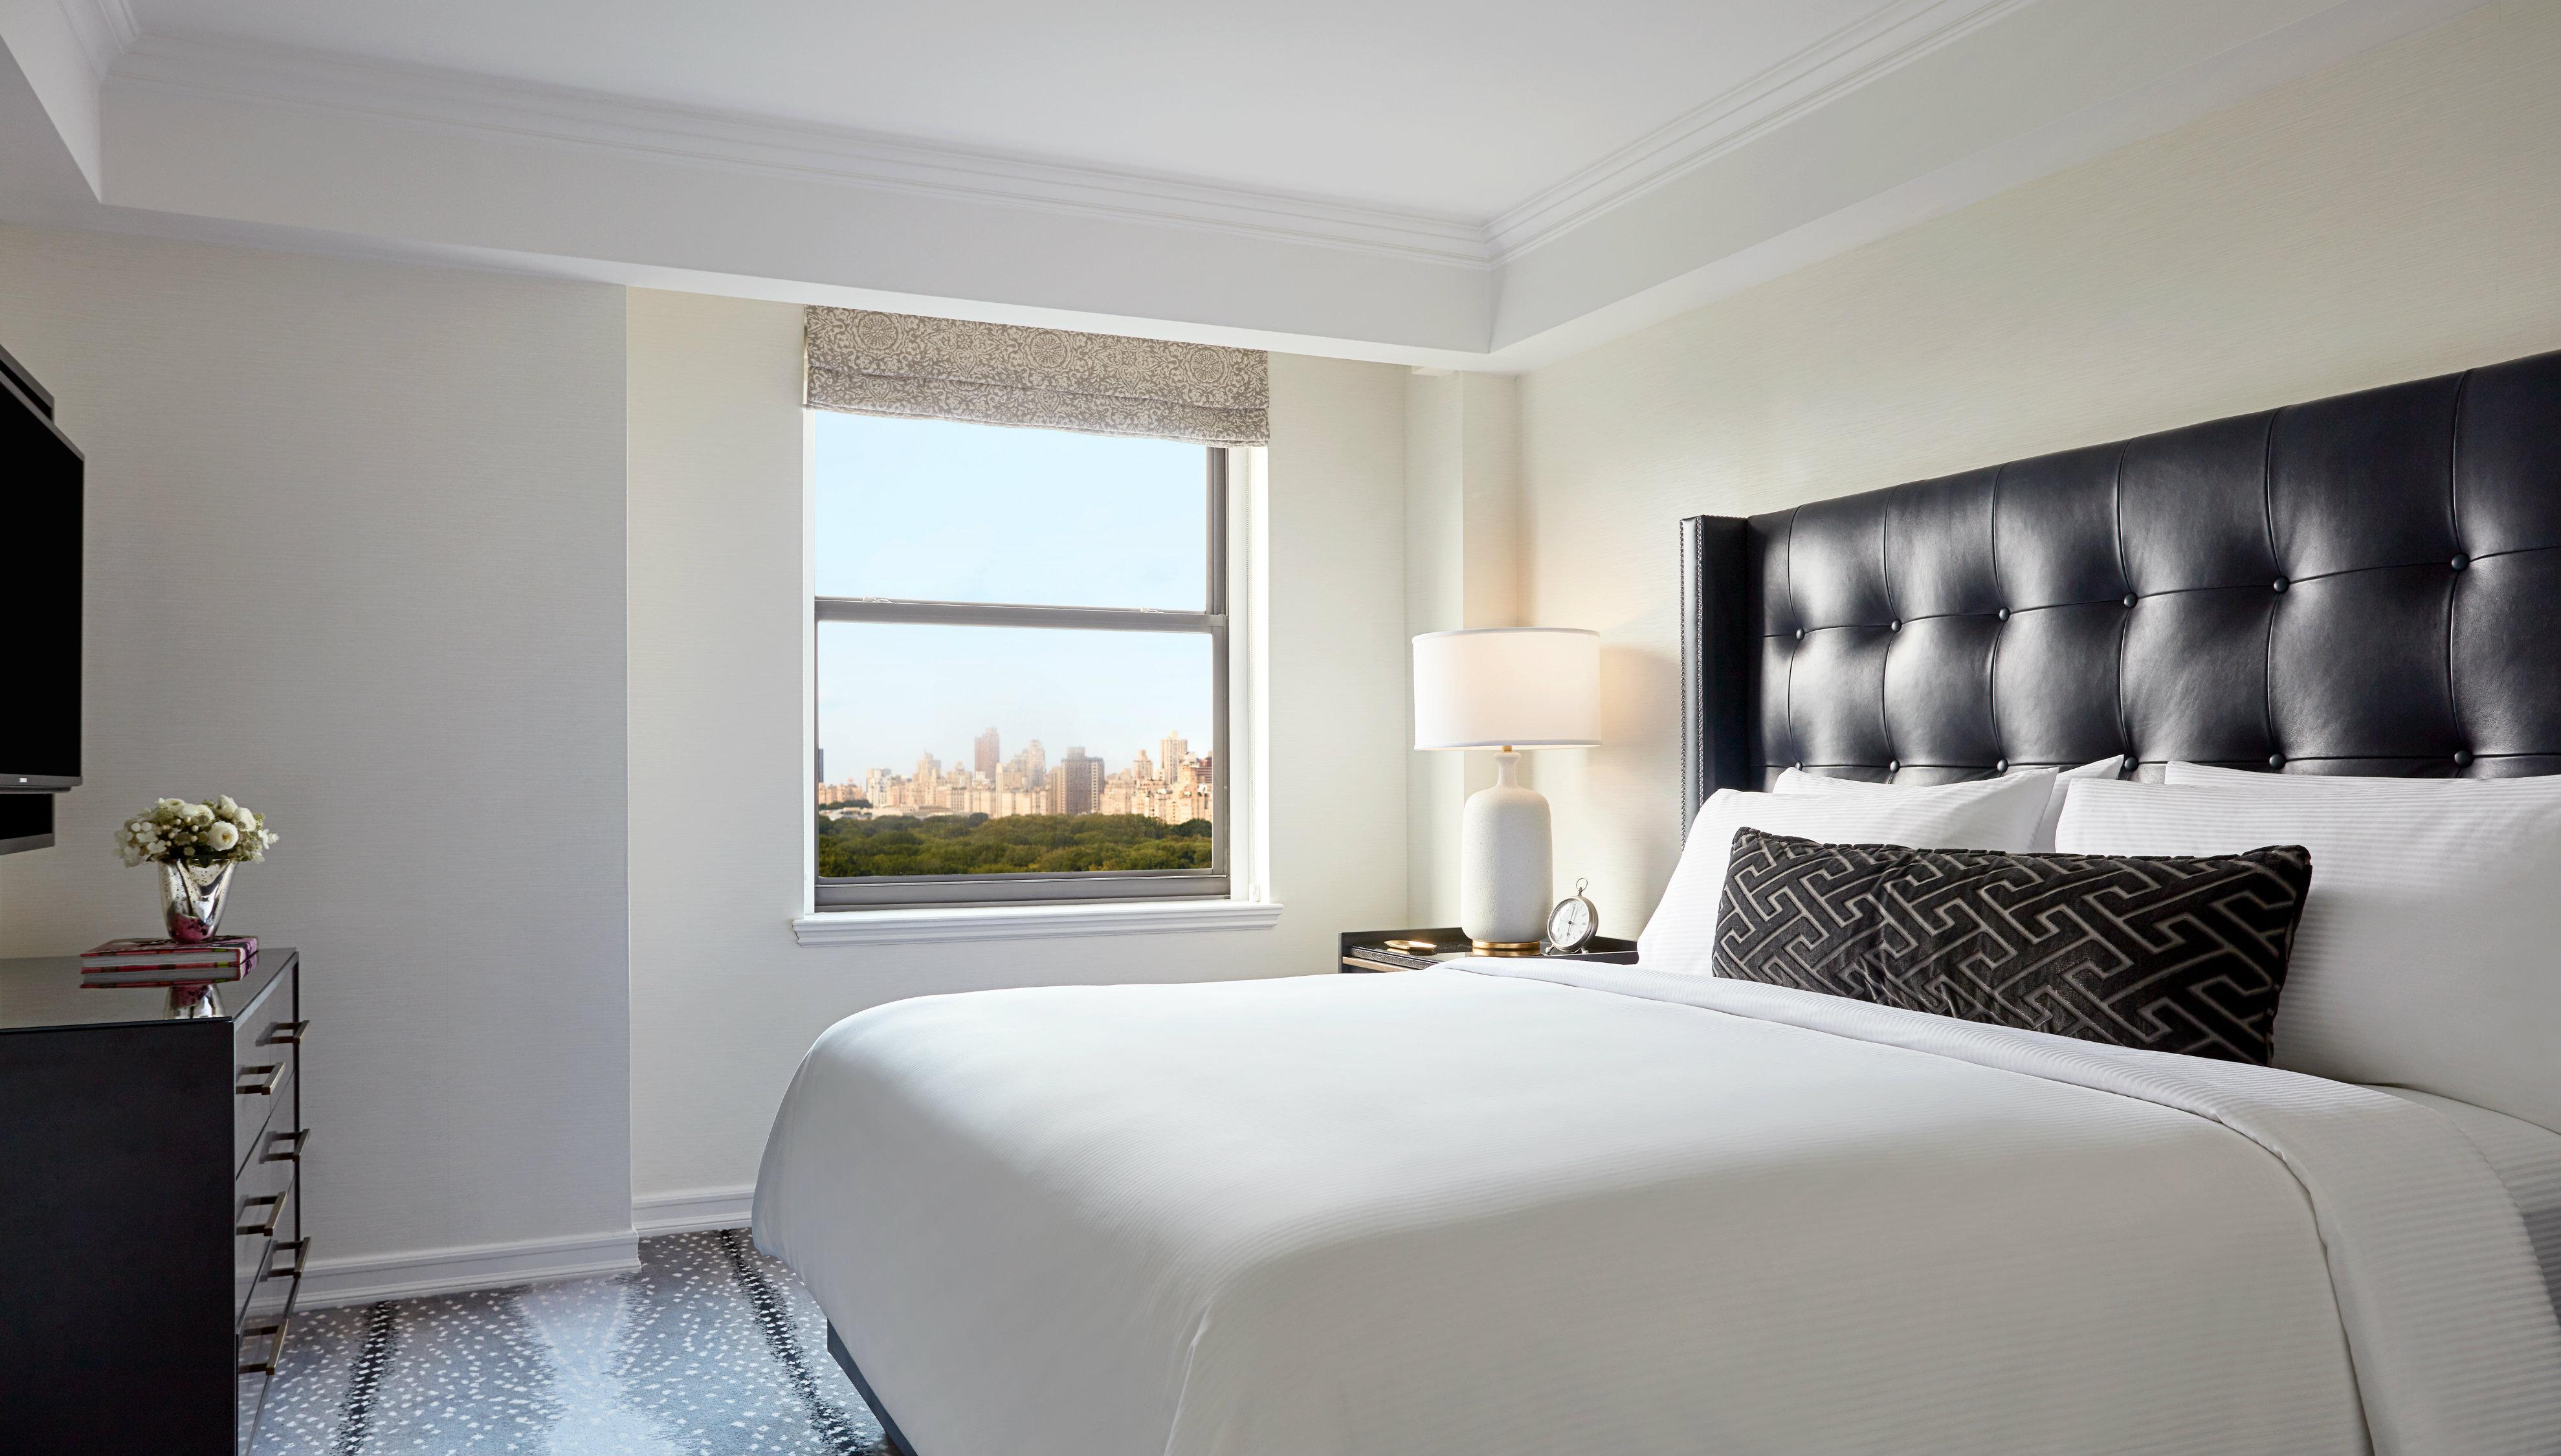 JW Marriott Essex House New York guestroom